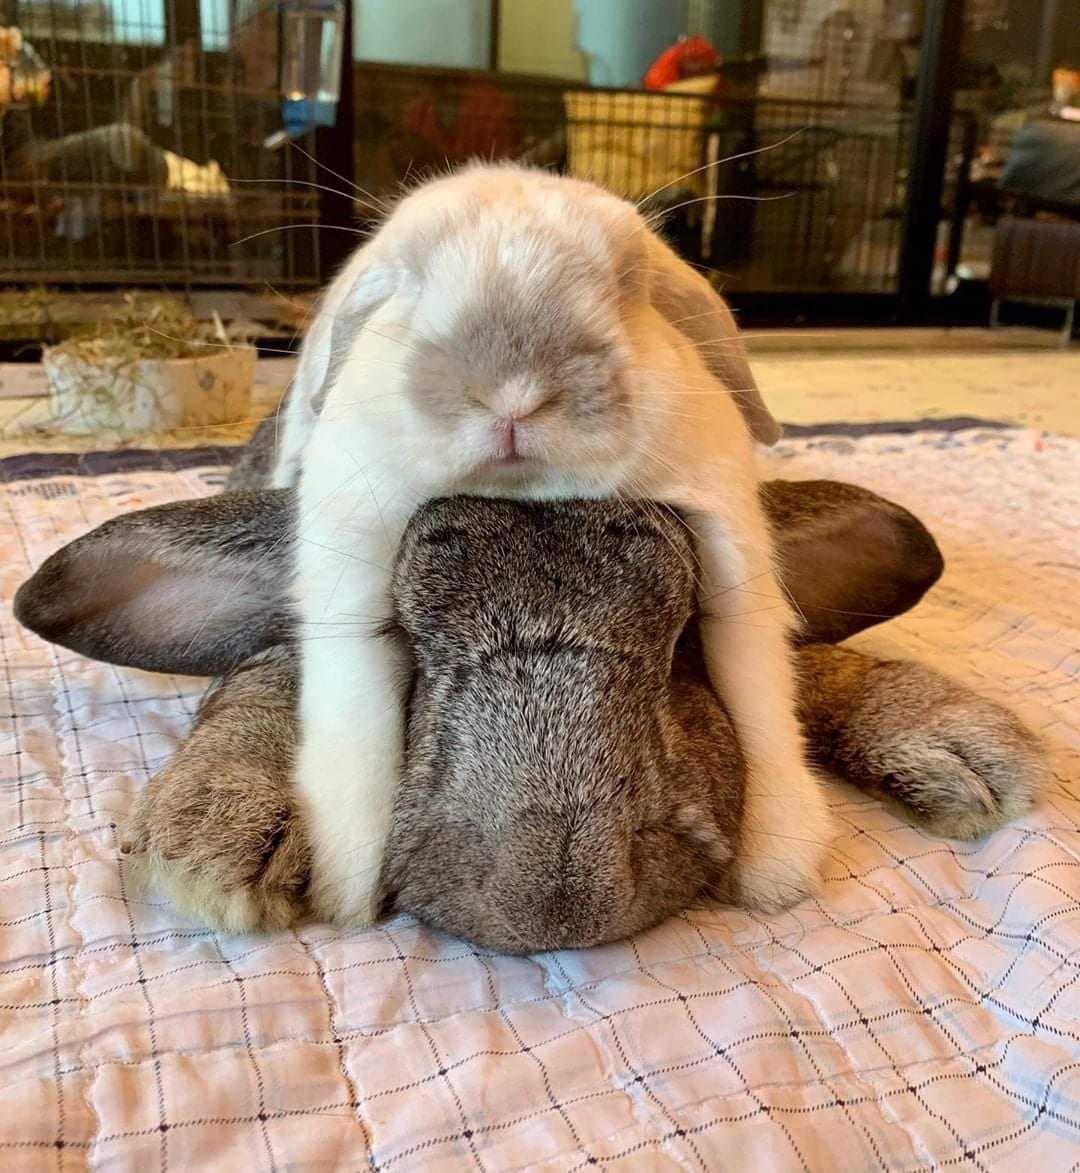 Sooooooooooo Tired! Bunny love - How do you make your indoor house rabbit love you? read our guides and tricks! Best treats for your bunny #rabbits #bunnies